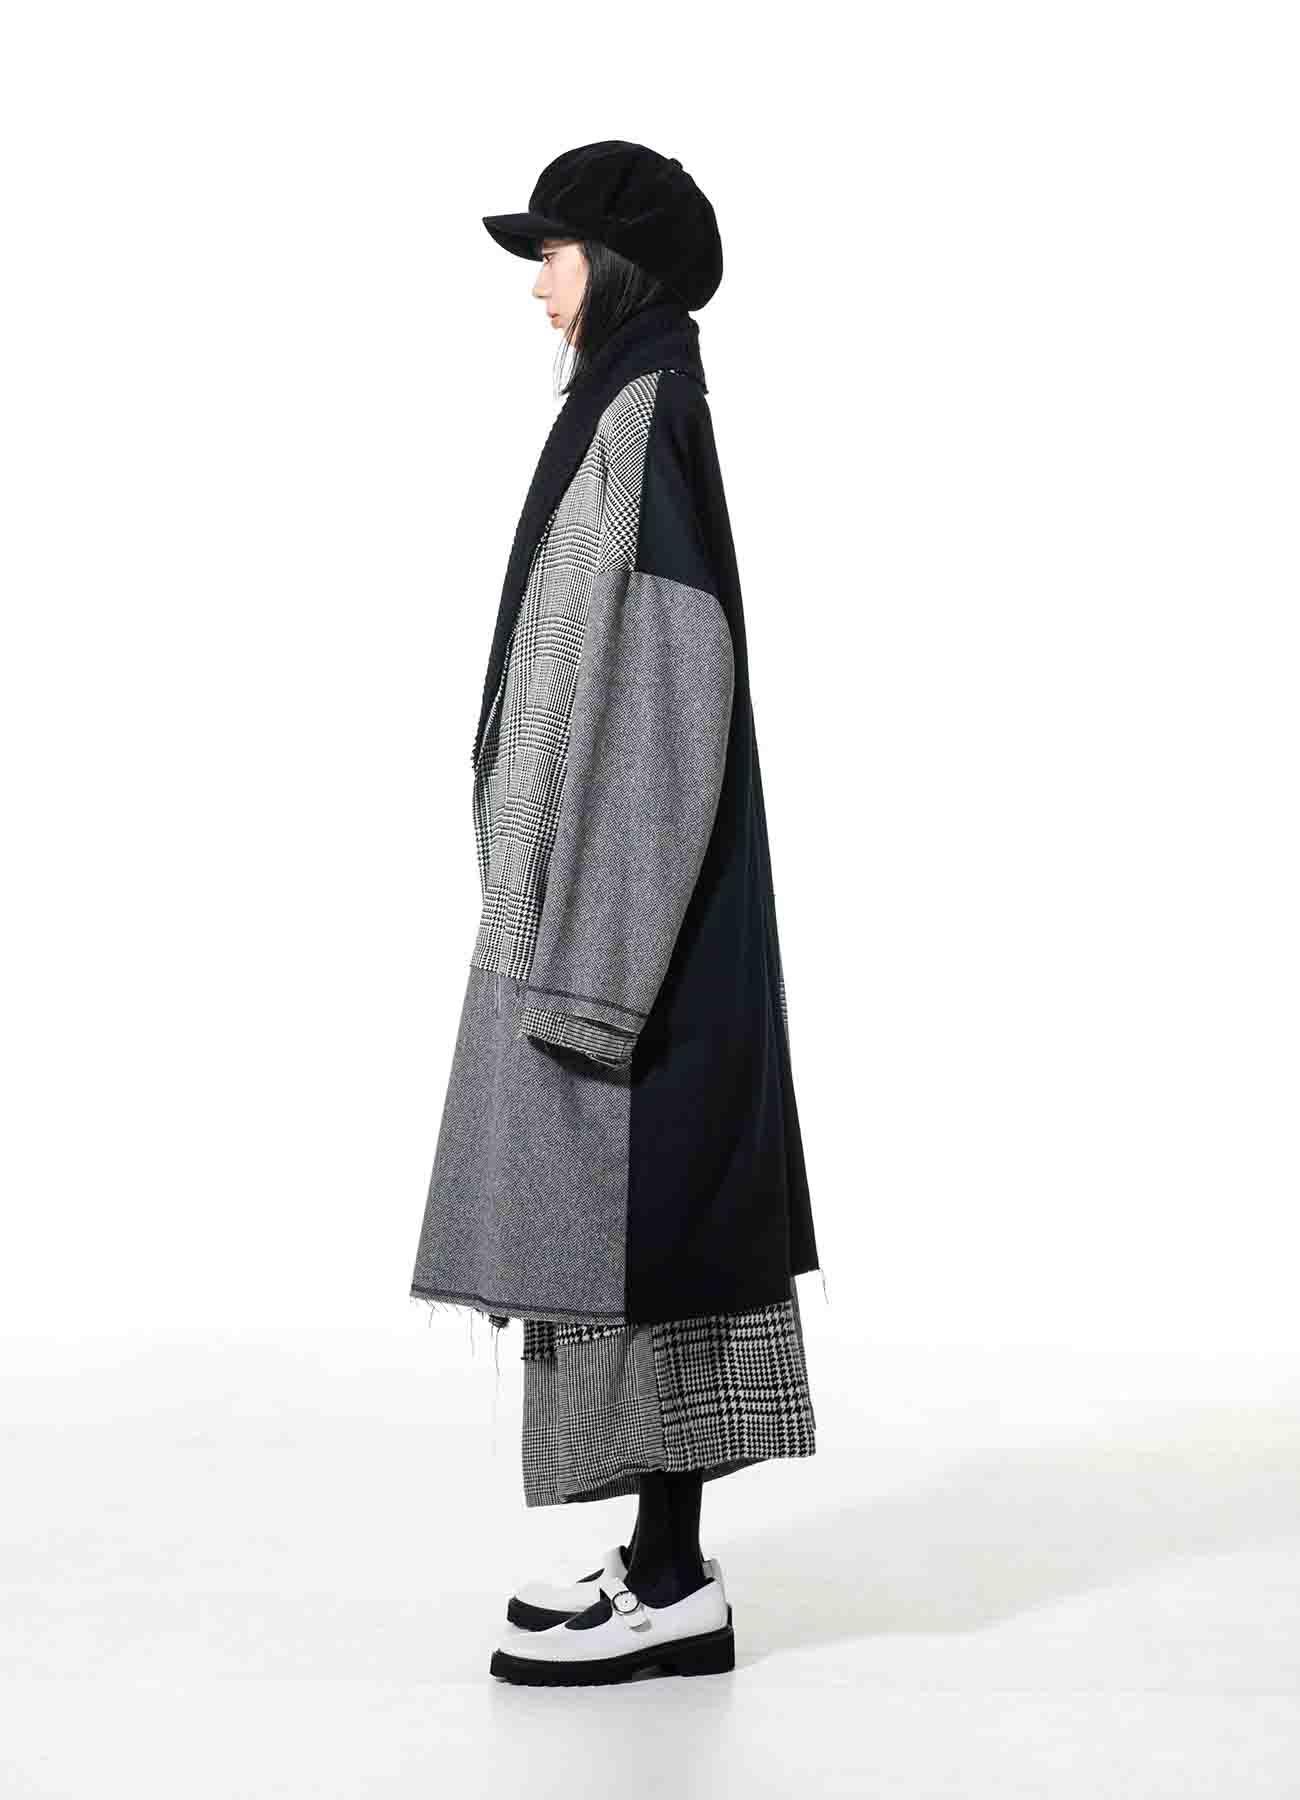 Crazy tweed/Mall knit Shawl Collar Big Gown Coat